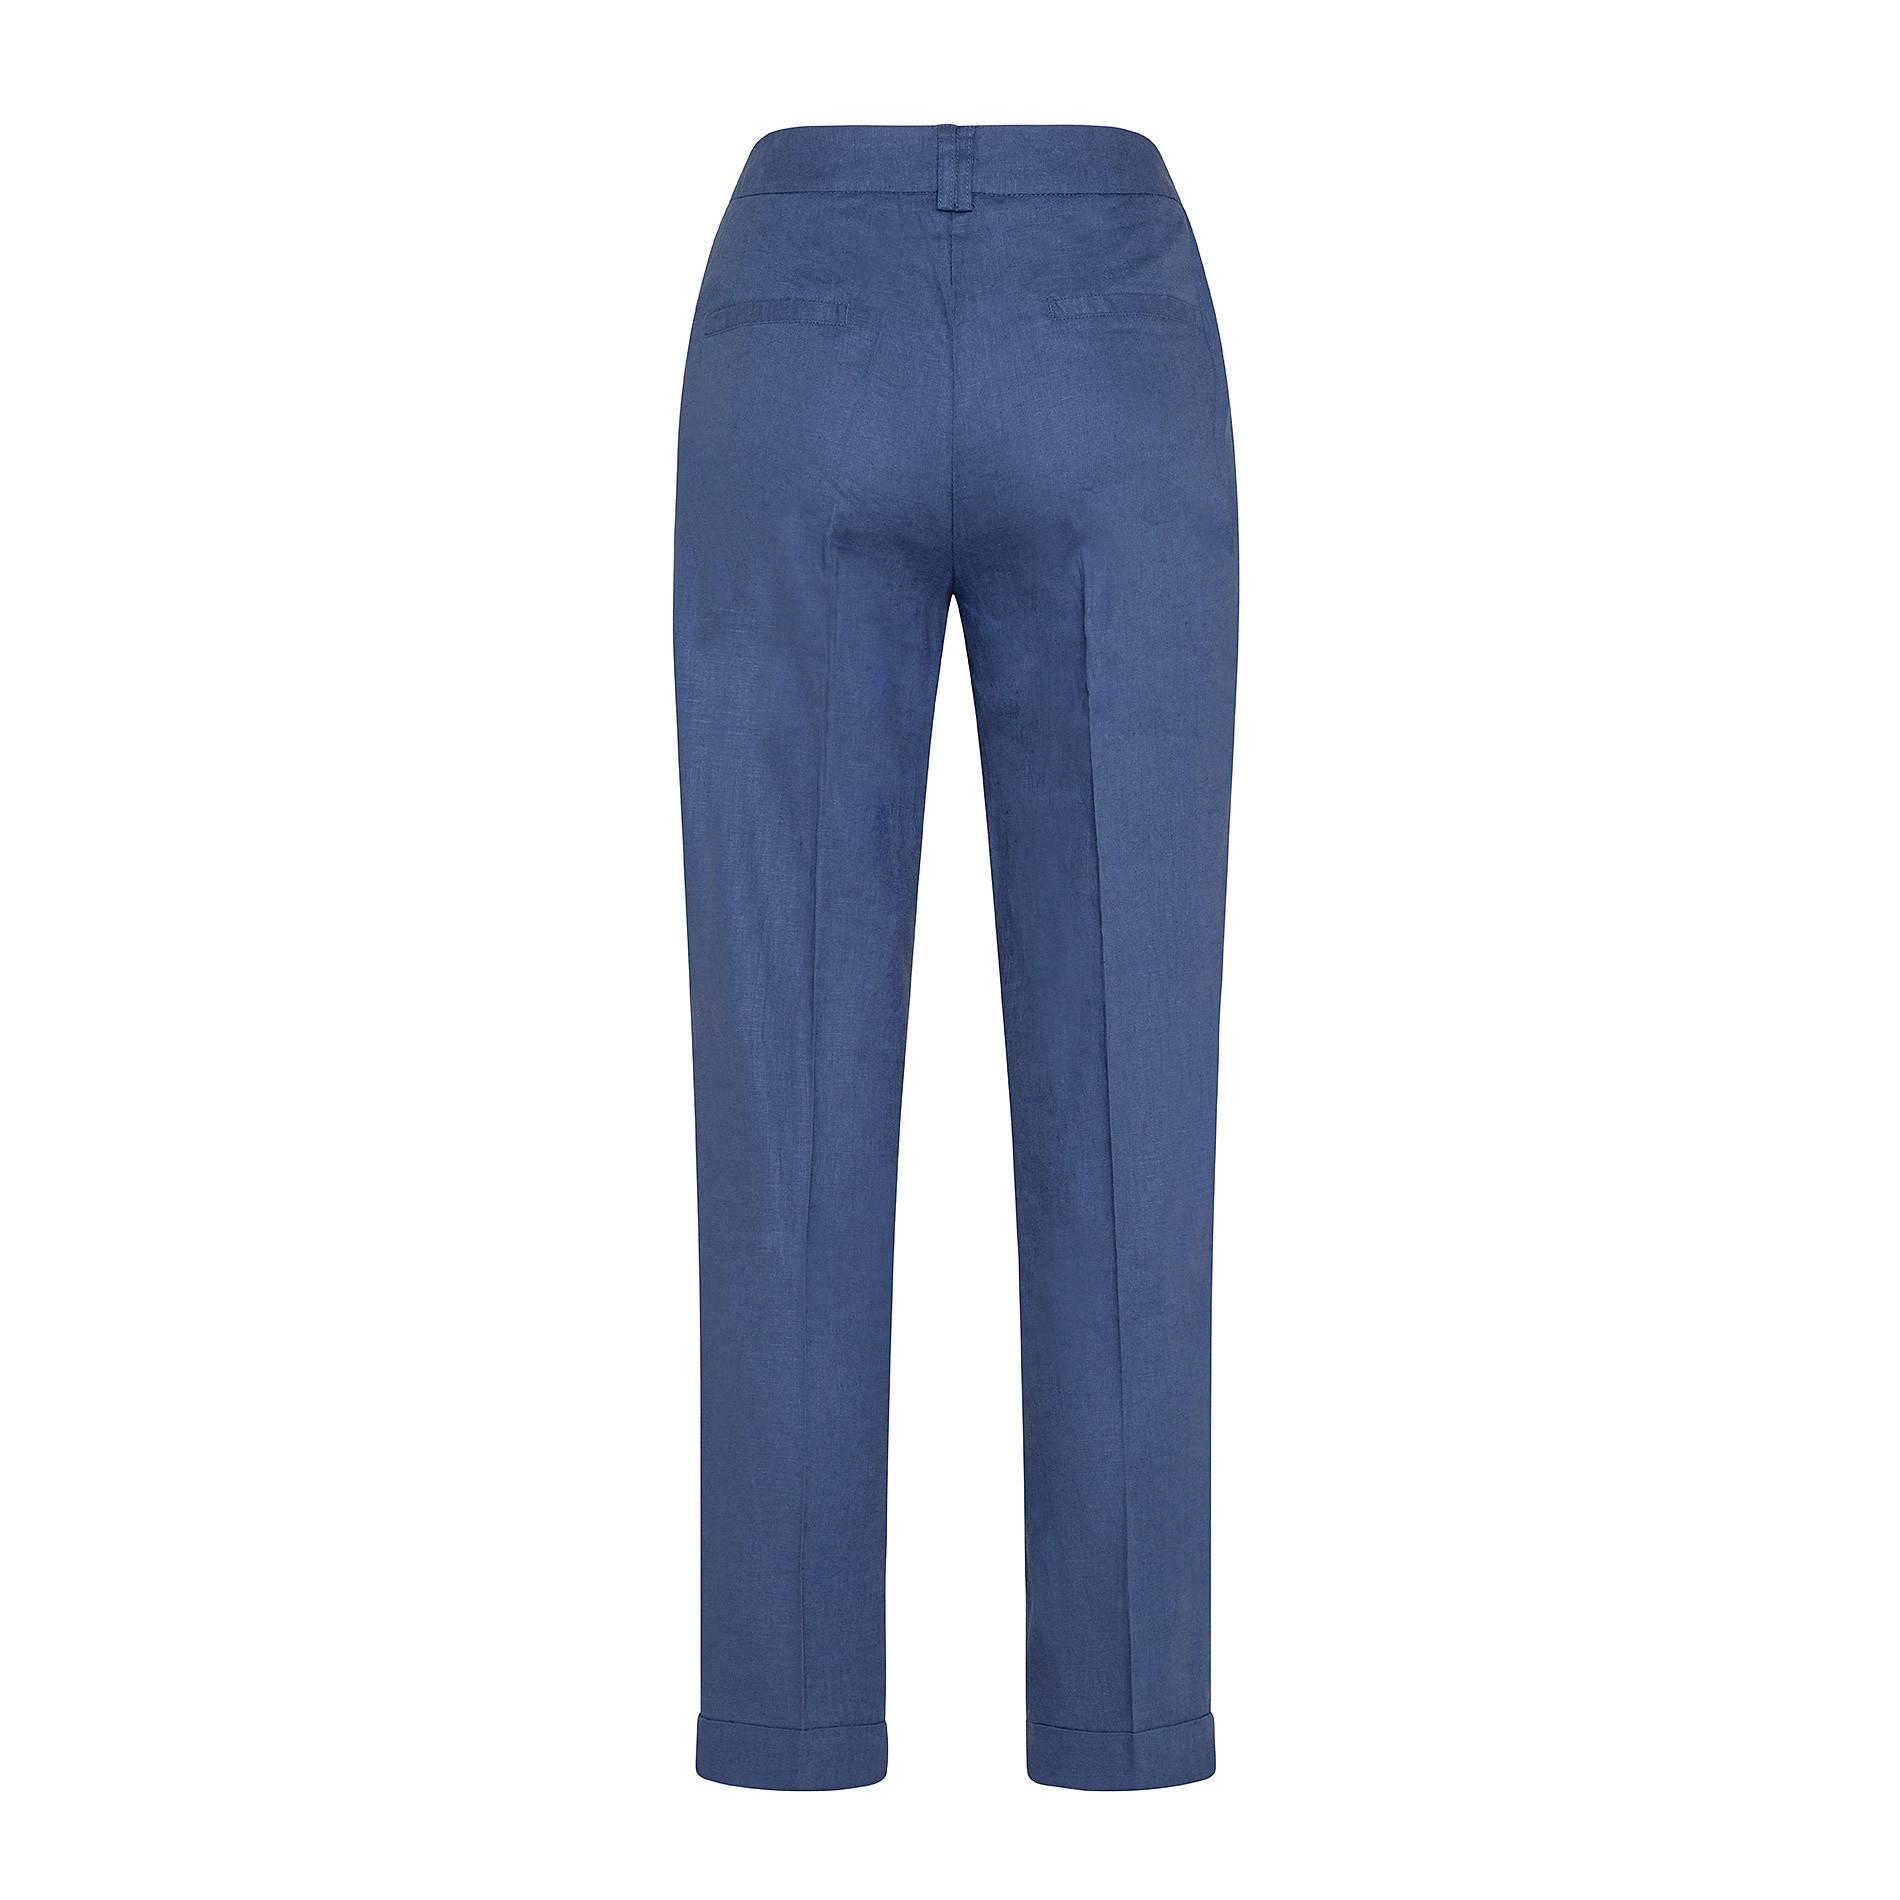 Pantalone classico in misto lino Koan, Blu scuro, large image number 1